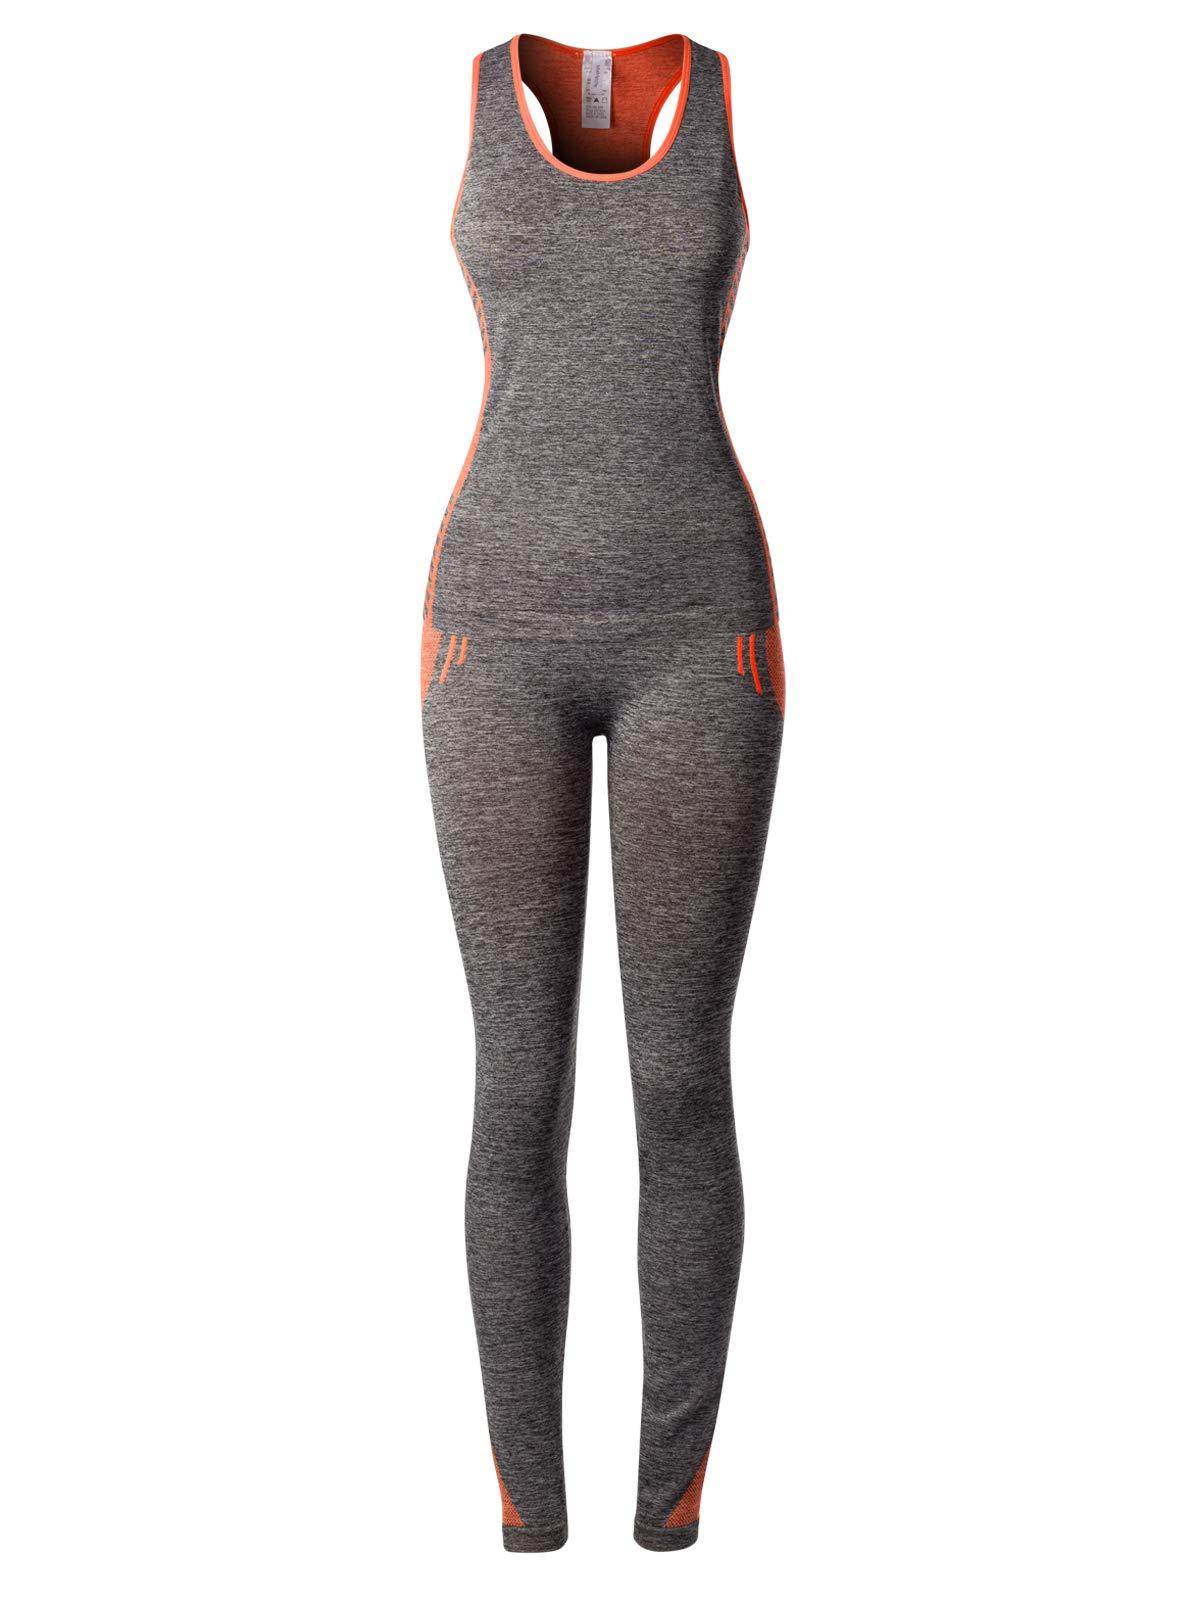 MixMatchy Women's Sports Gym Yoga Workout Activewear Sets Top & Leggings Set2 Grey/Orange ONE by MixMatchy